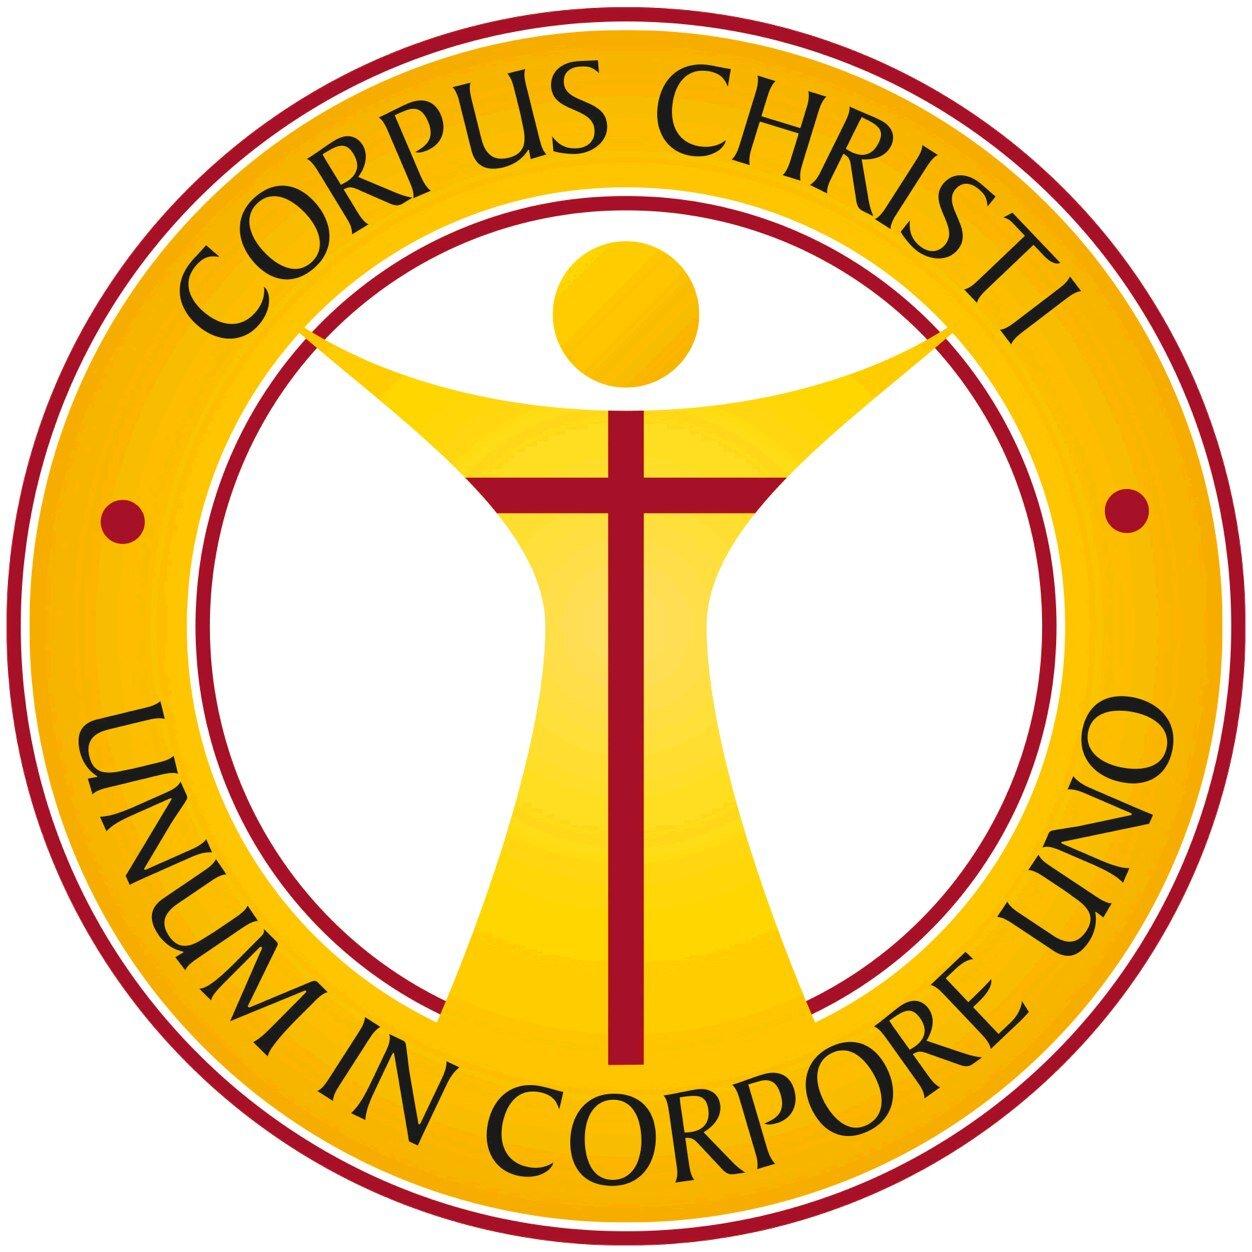 Corpus Christi Catholic Symbols